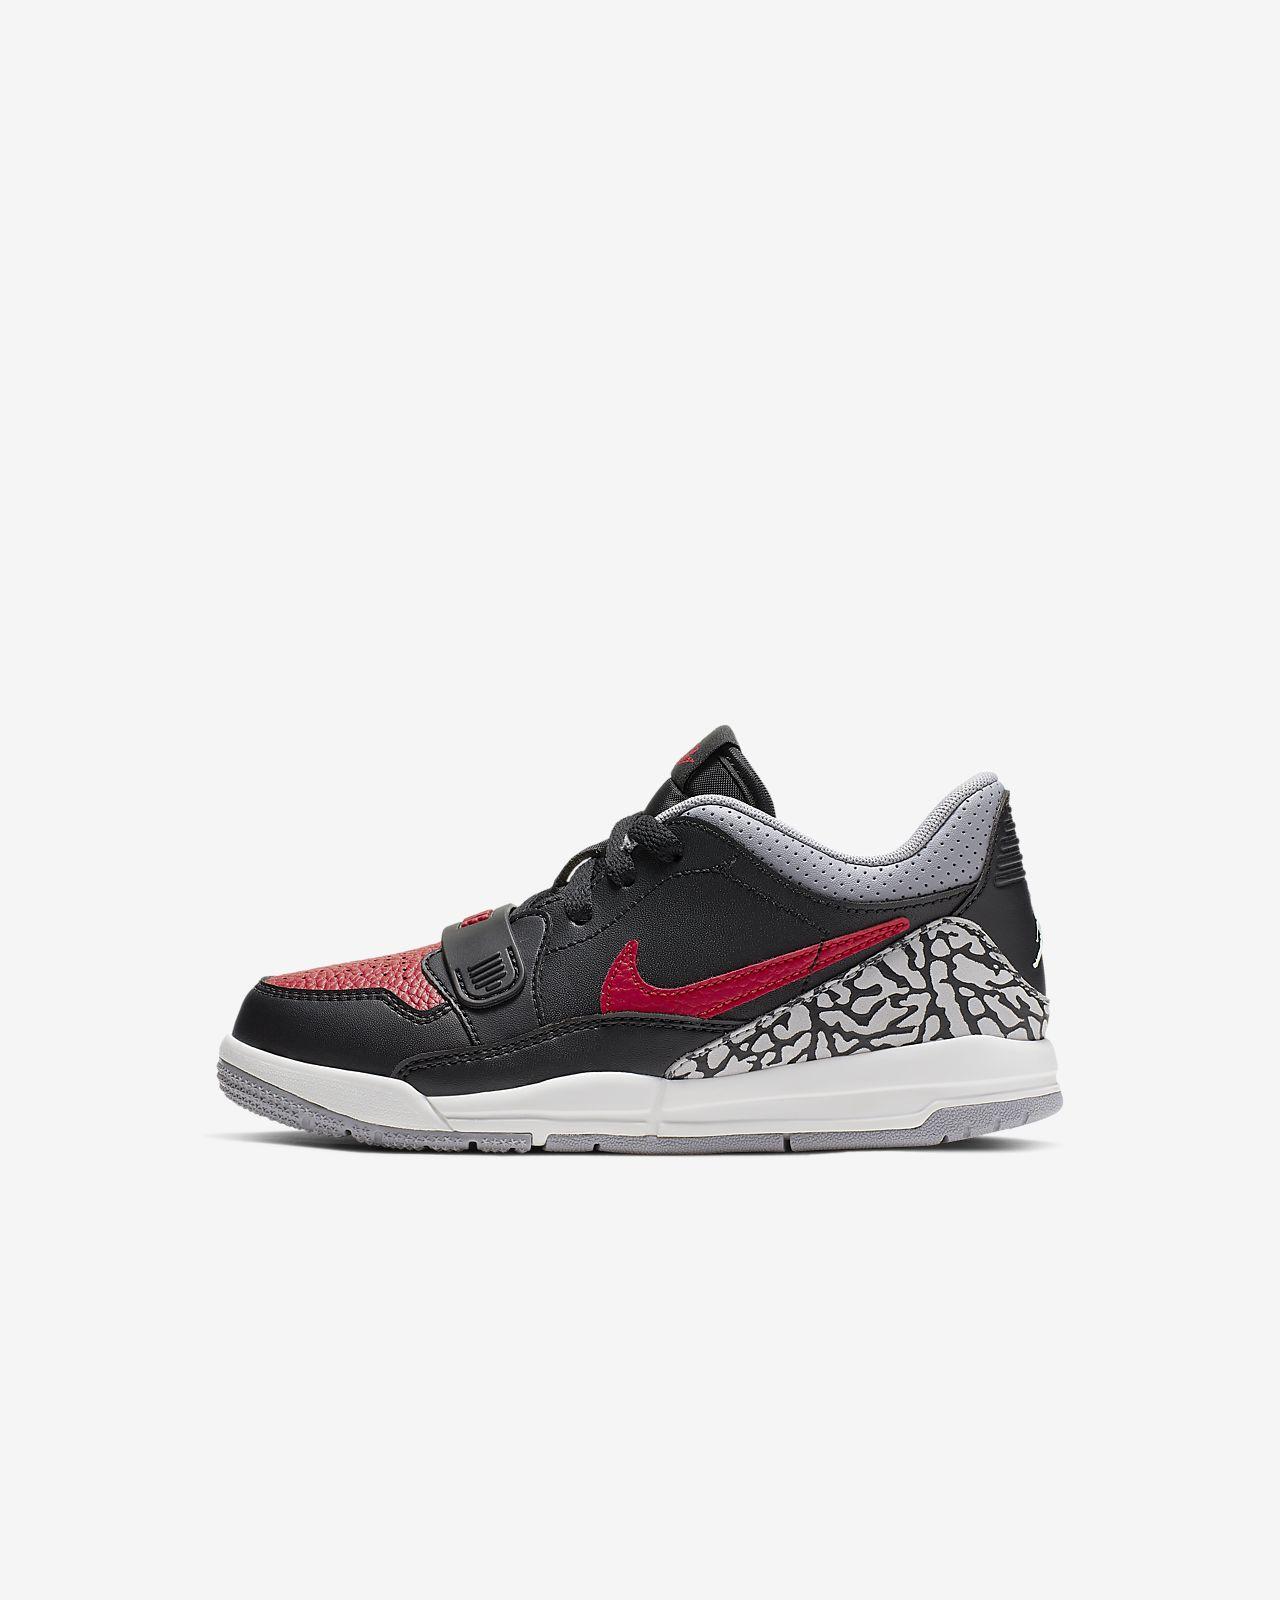 ad8df5308e Scarpa Air Jordan Legacy 312 Low - Bambini. Nike.com IT